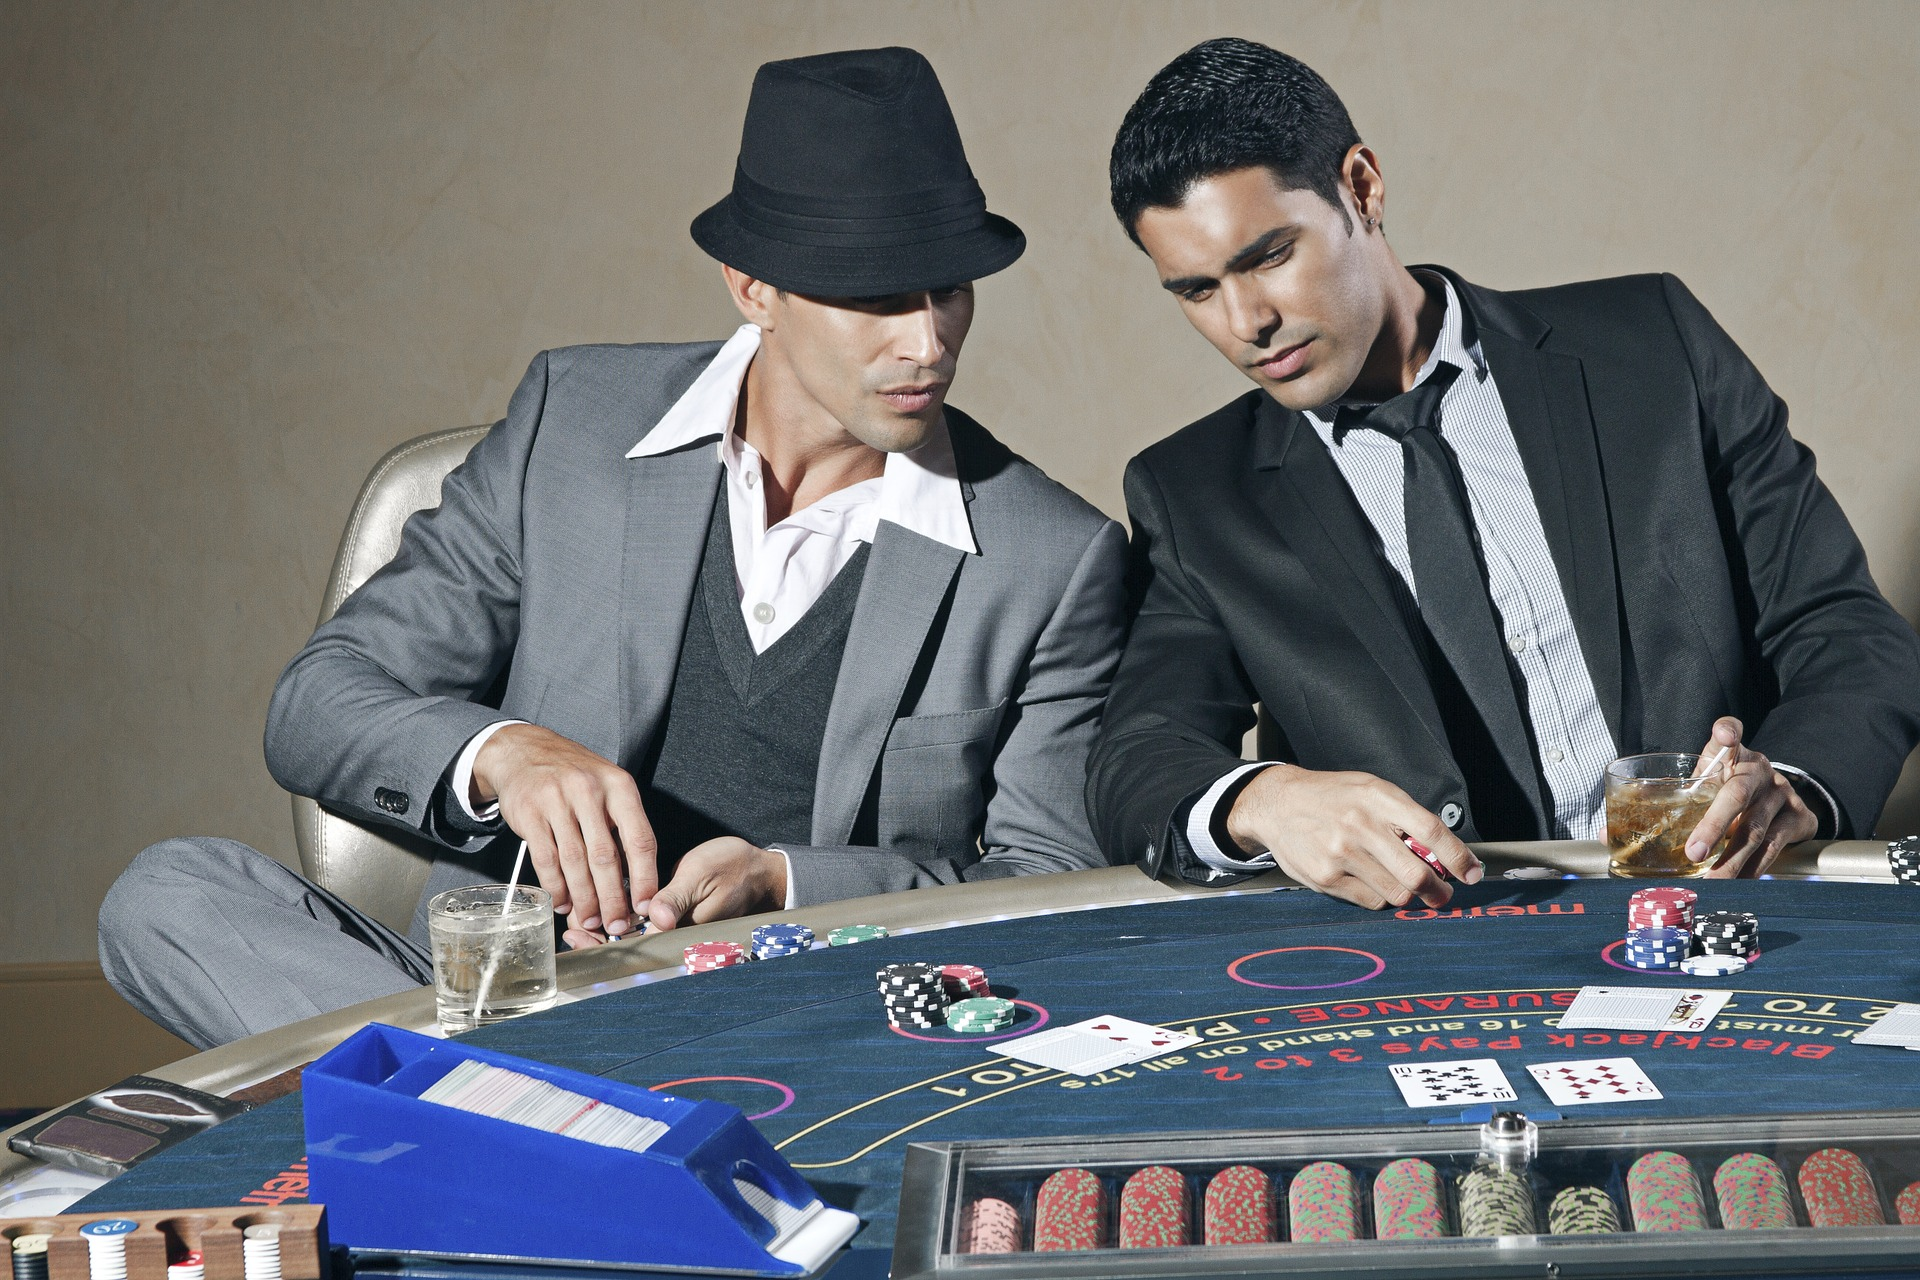 Mlbjerseys - Casino